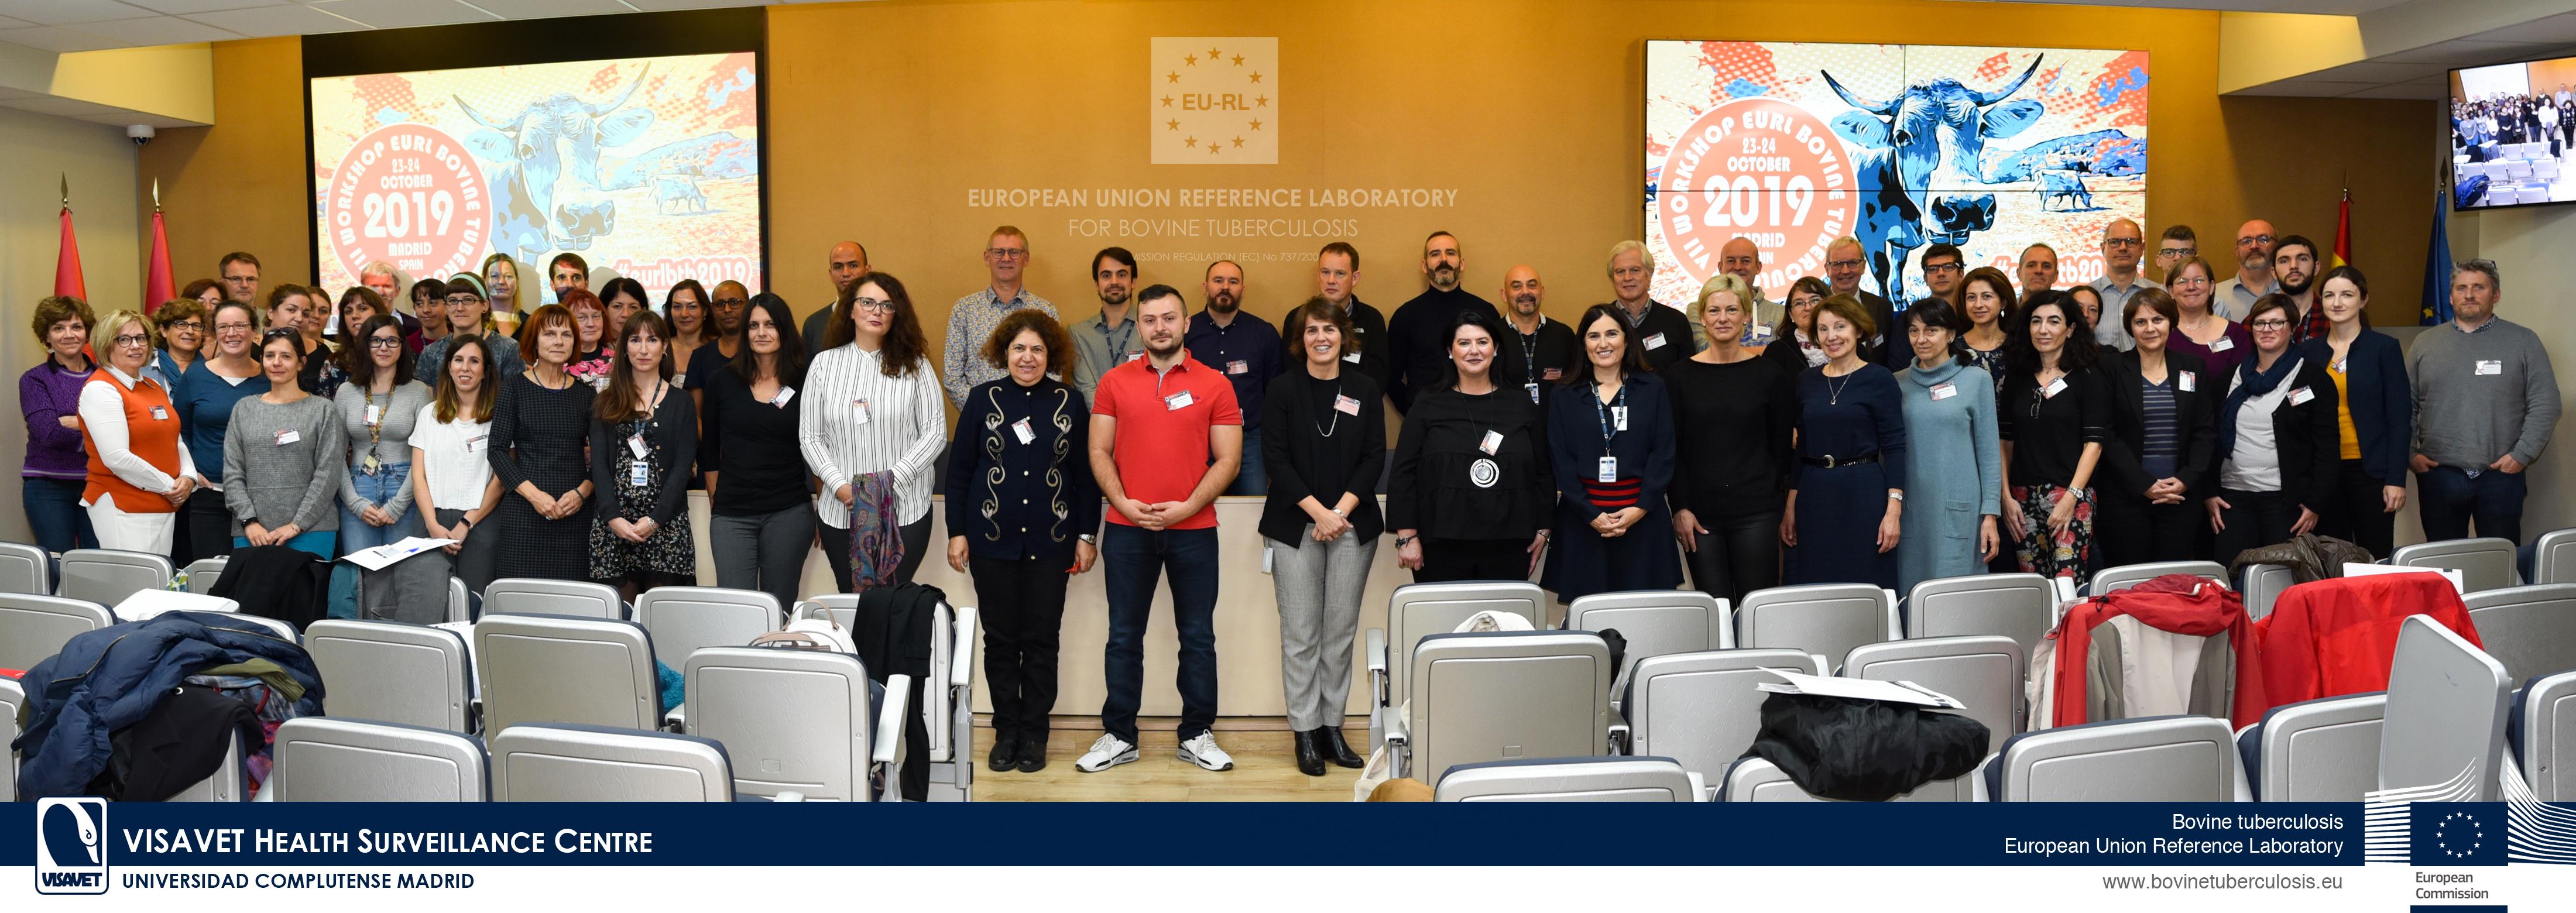 VII Workshop EU-RL for Bovine Tuberculosis